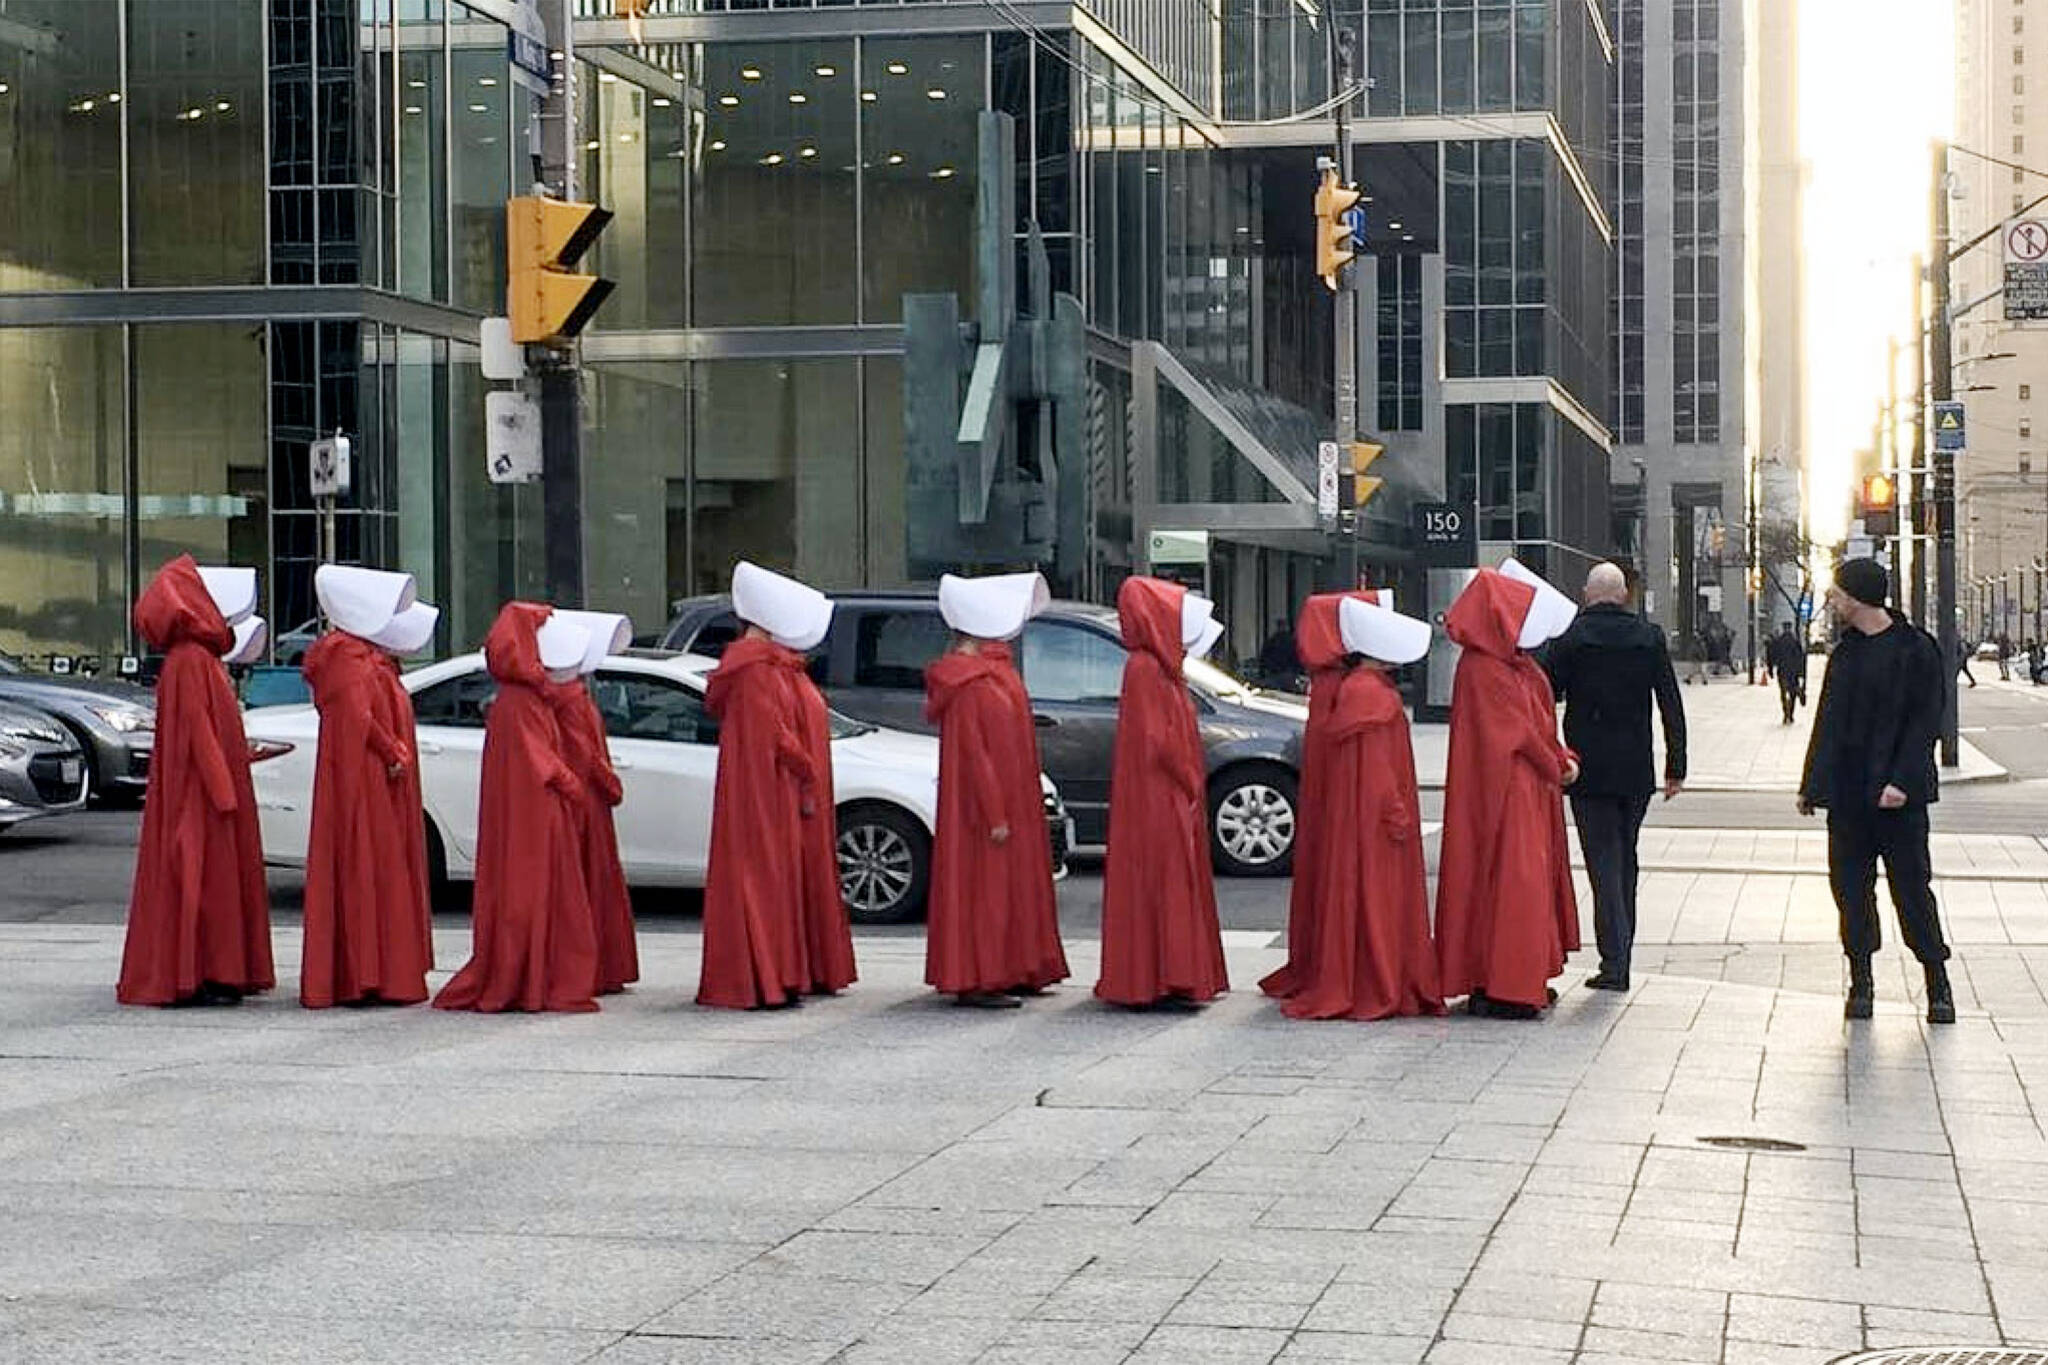 Handmaids Tale Toronto